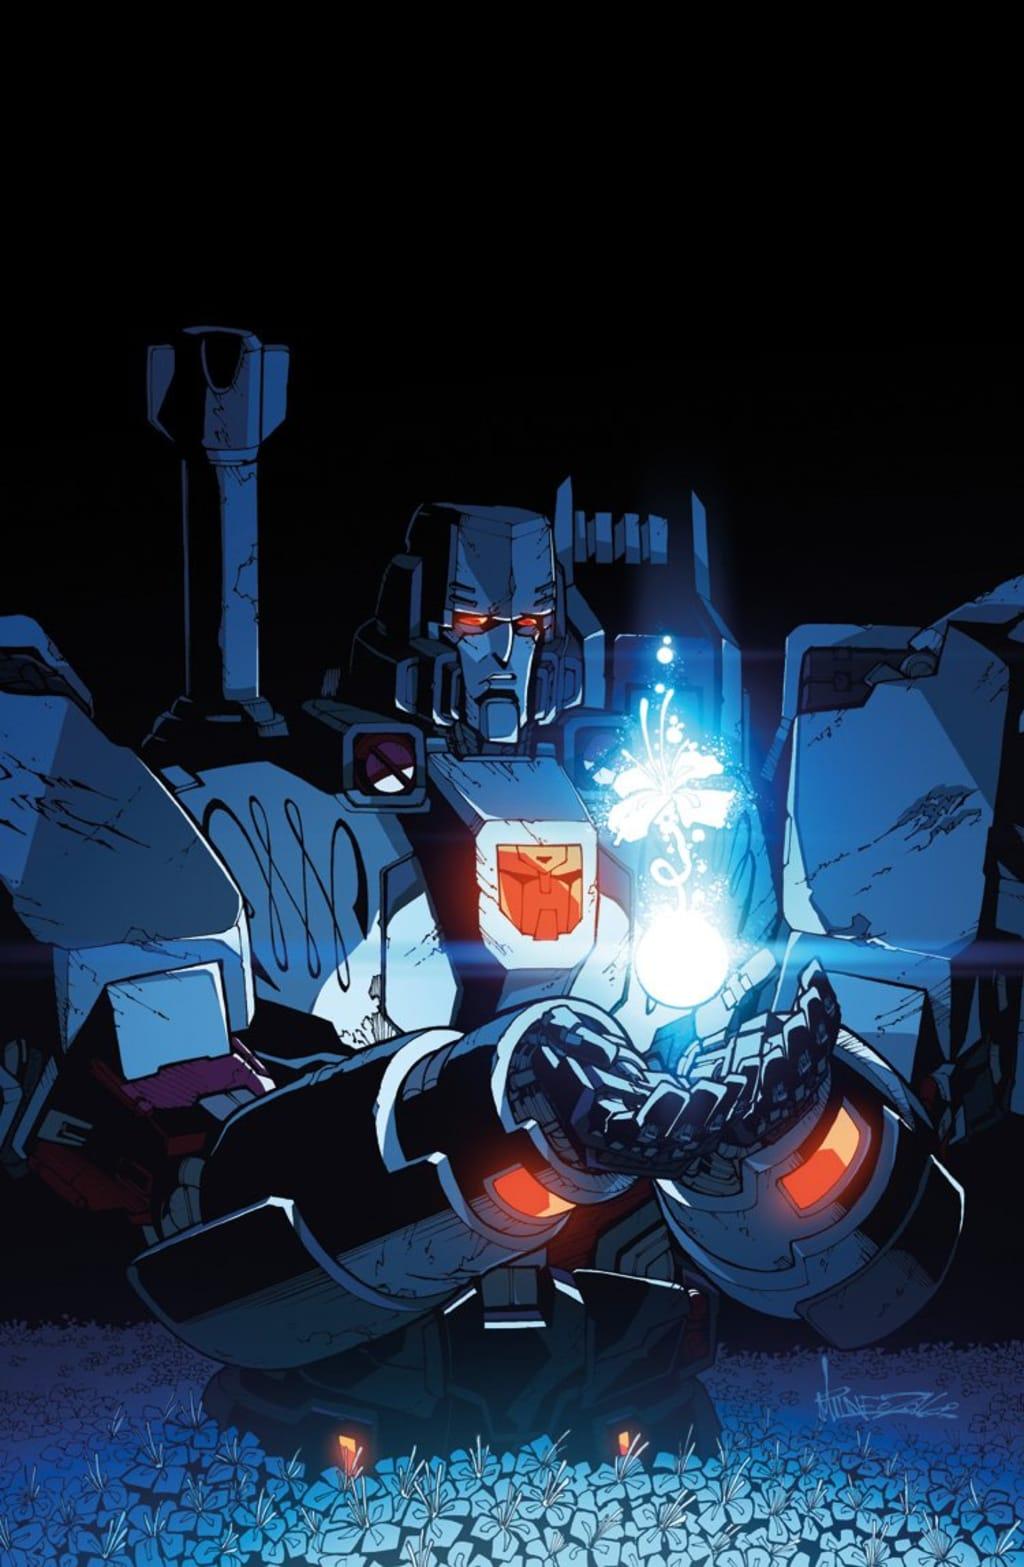 Autobot Megatron: Redefining a Villain